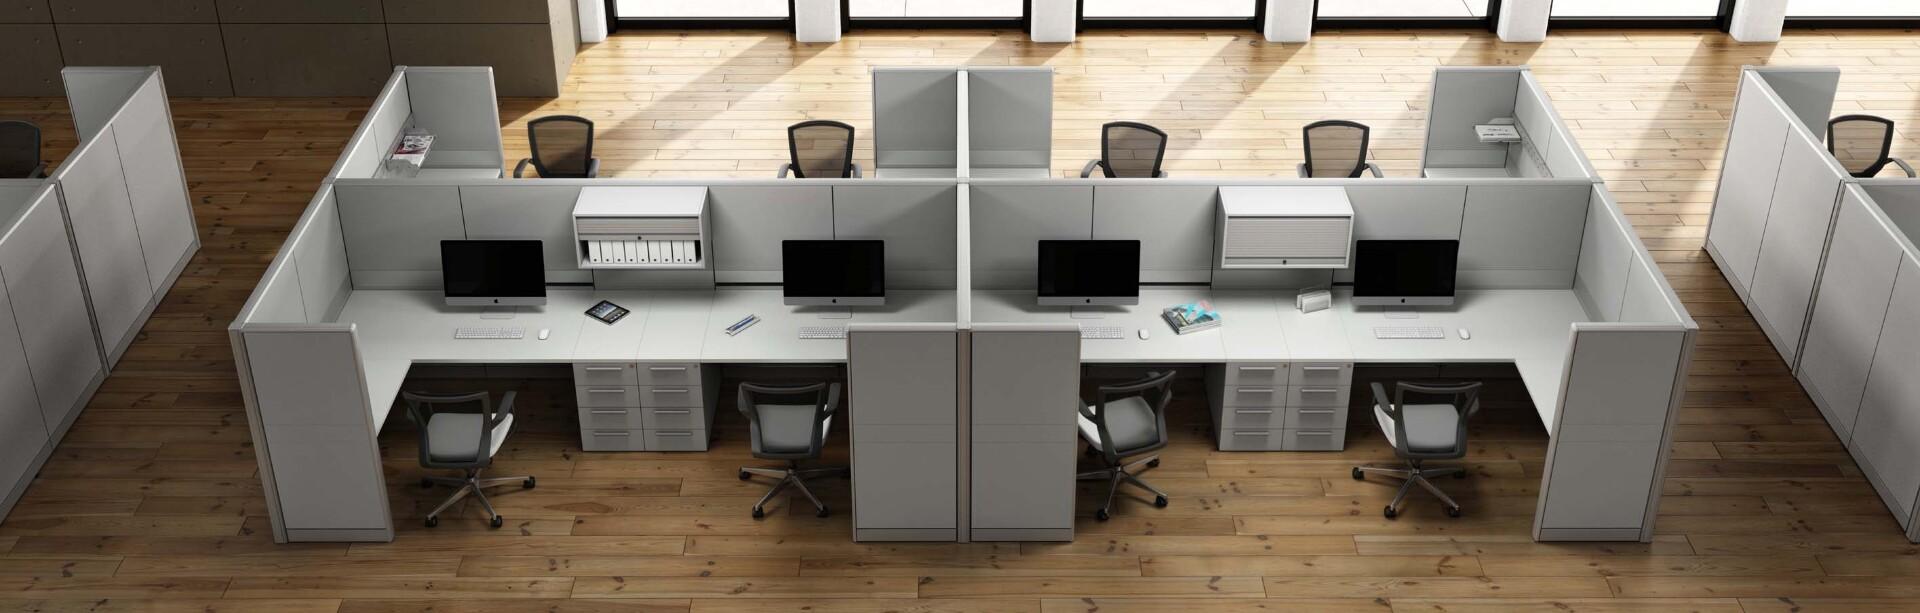 multipostazione-call-center-kubi.jpg